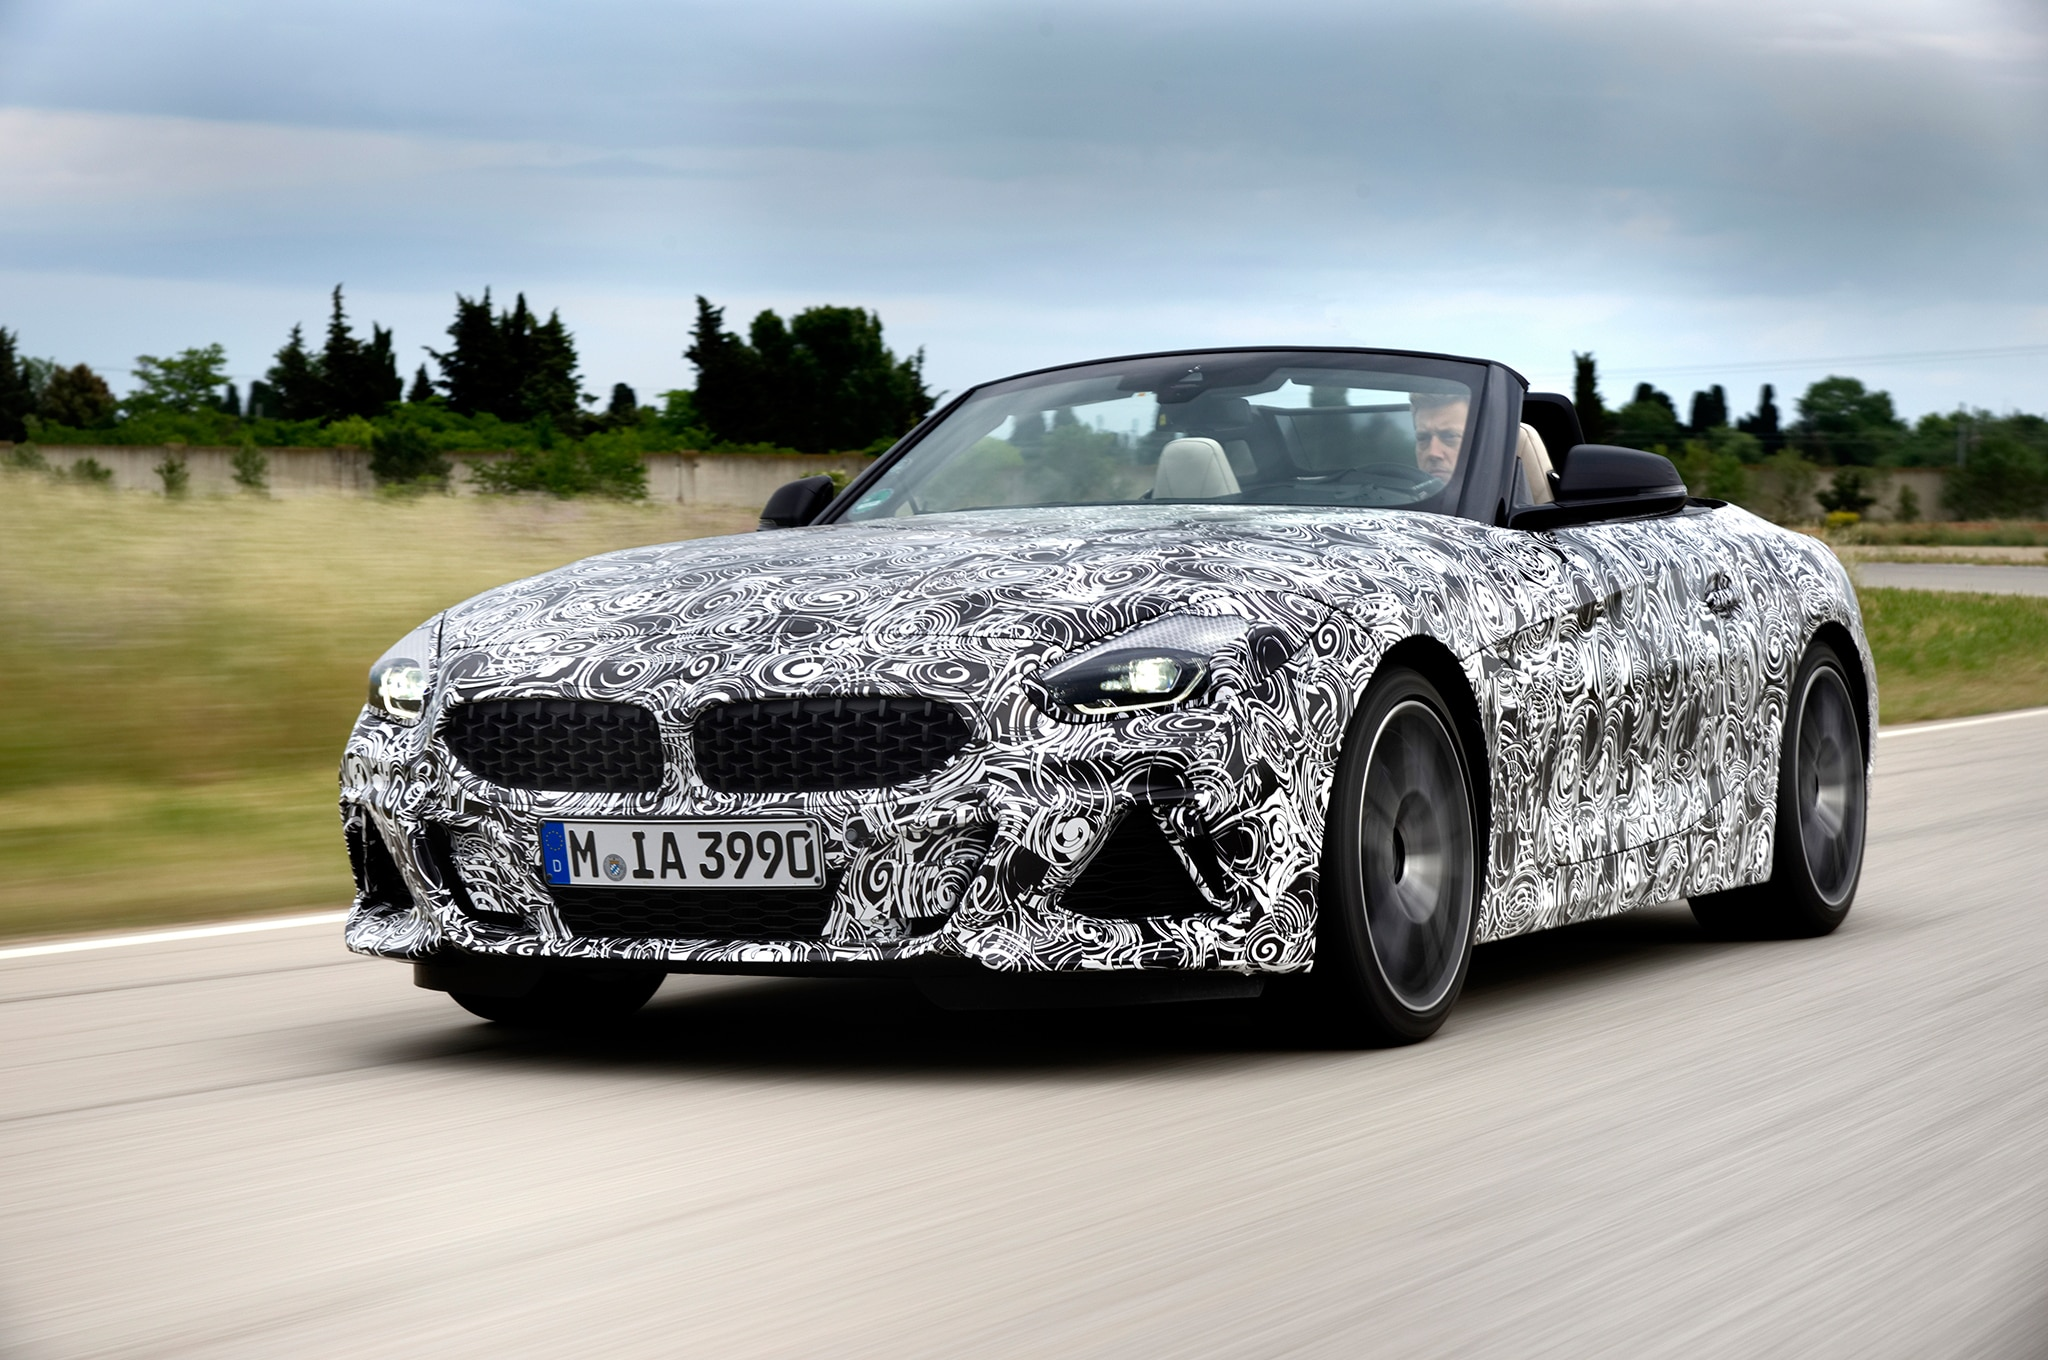 2019 BMW Z4 M40i Prototype Front Three Quarter In Motion 14